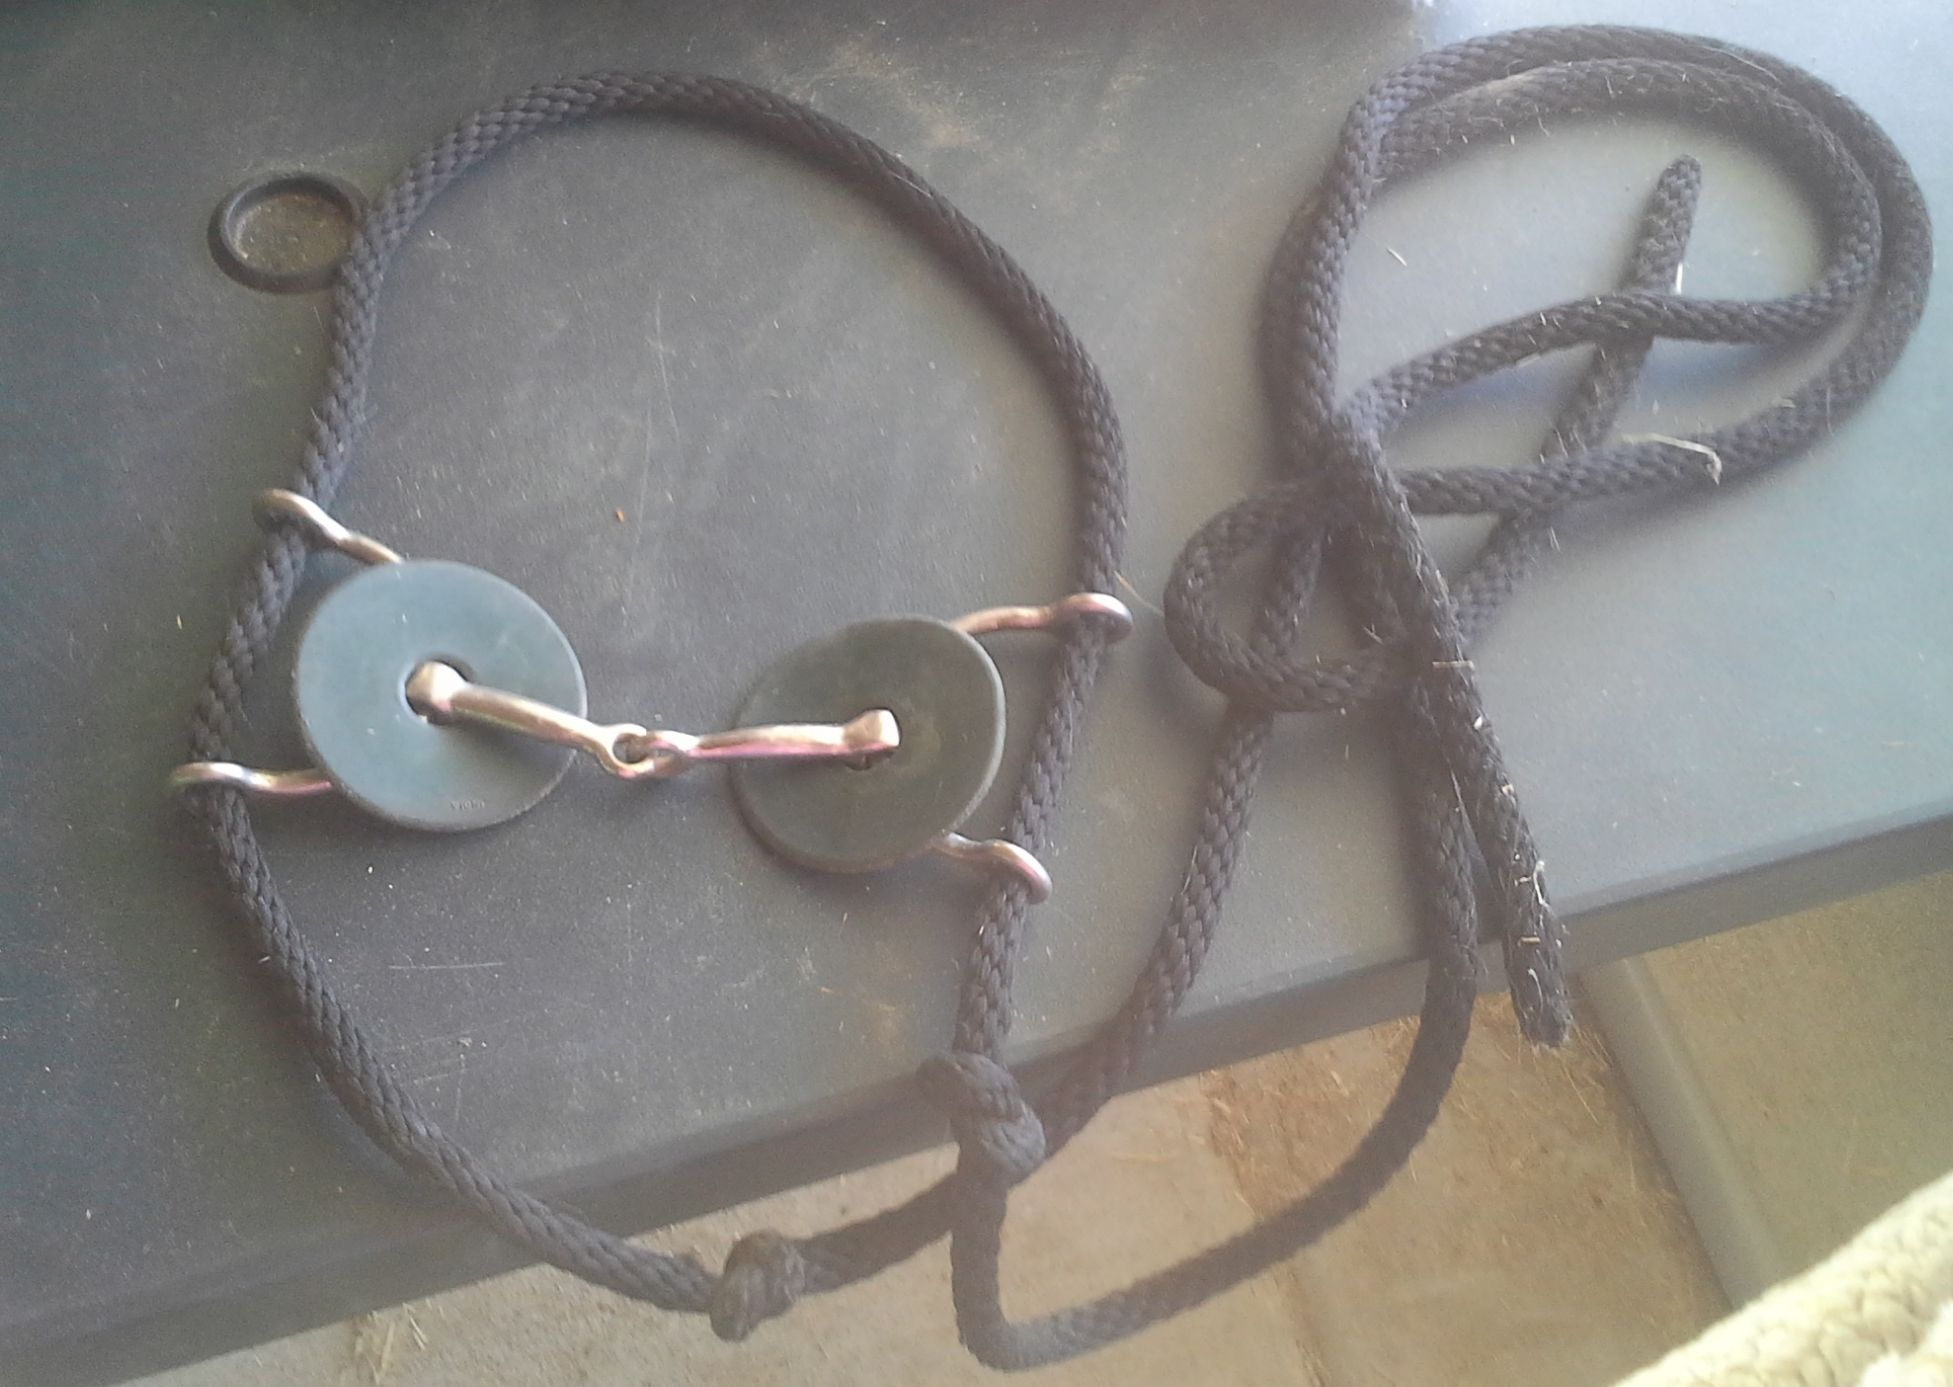 "USED 5"" Gag Bit w/rubber rings & rope  $10"